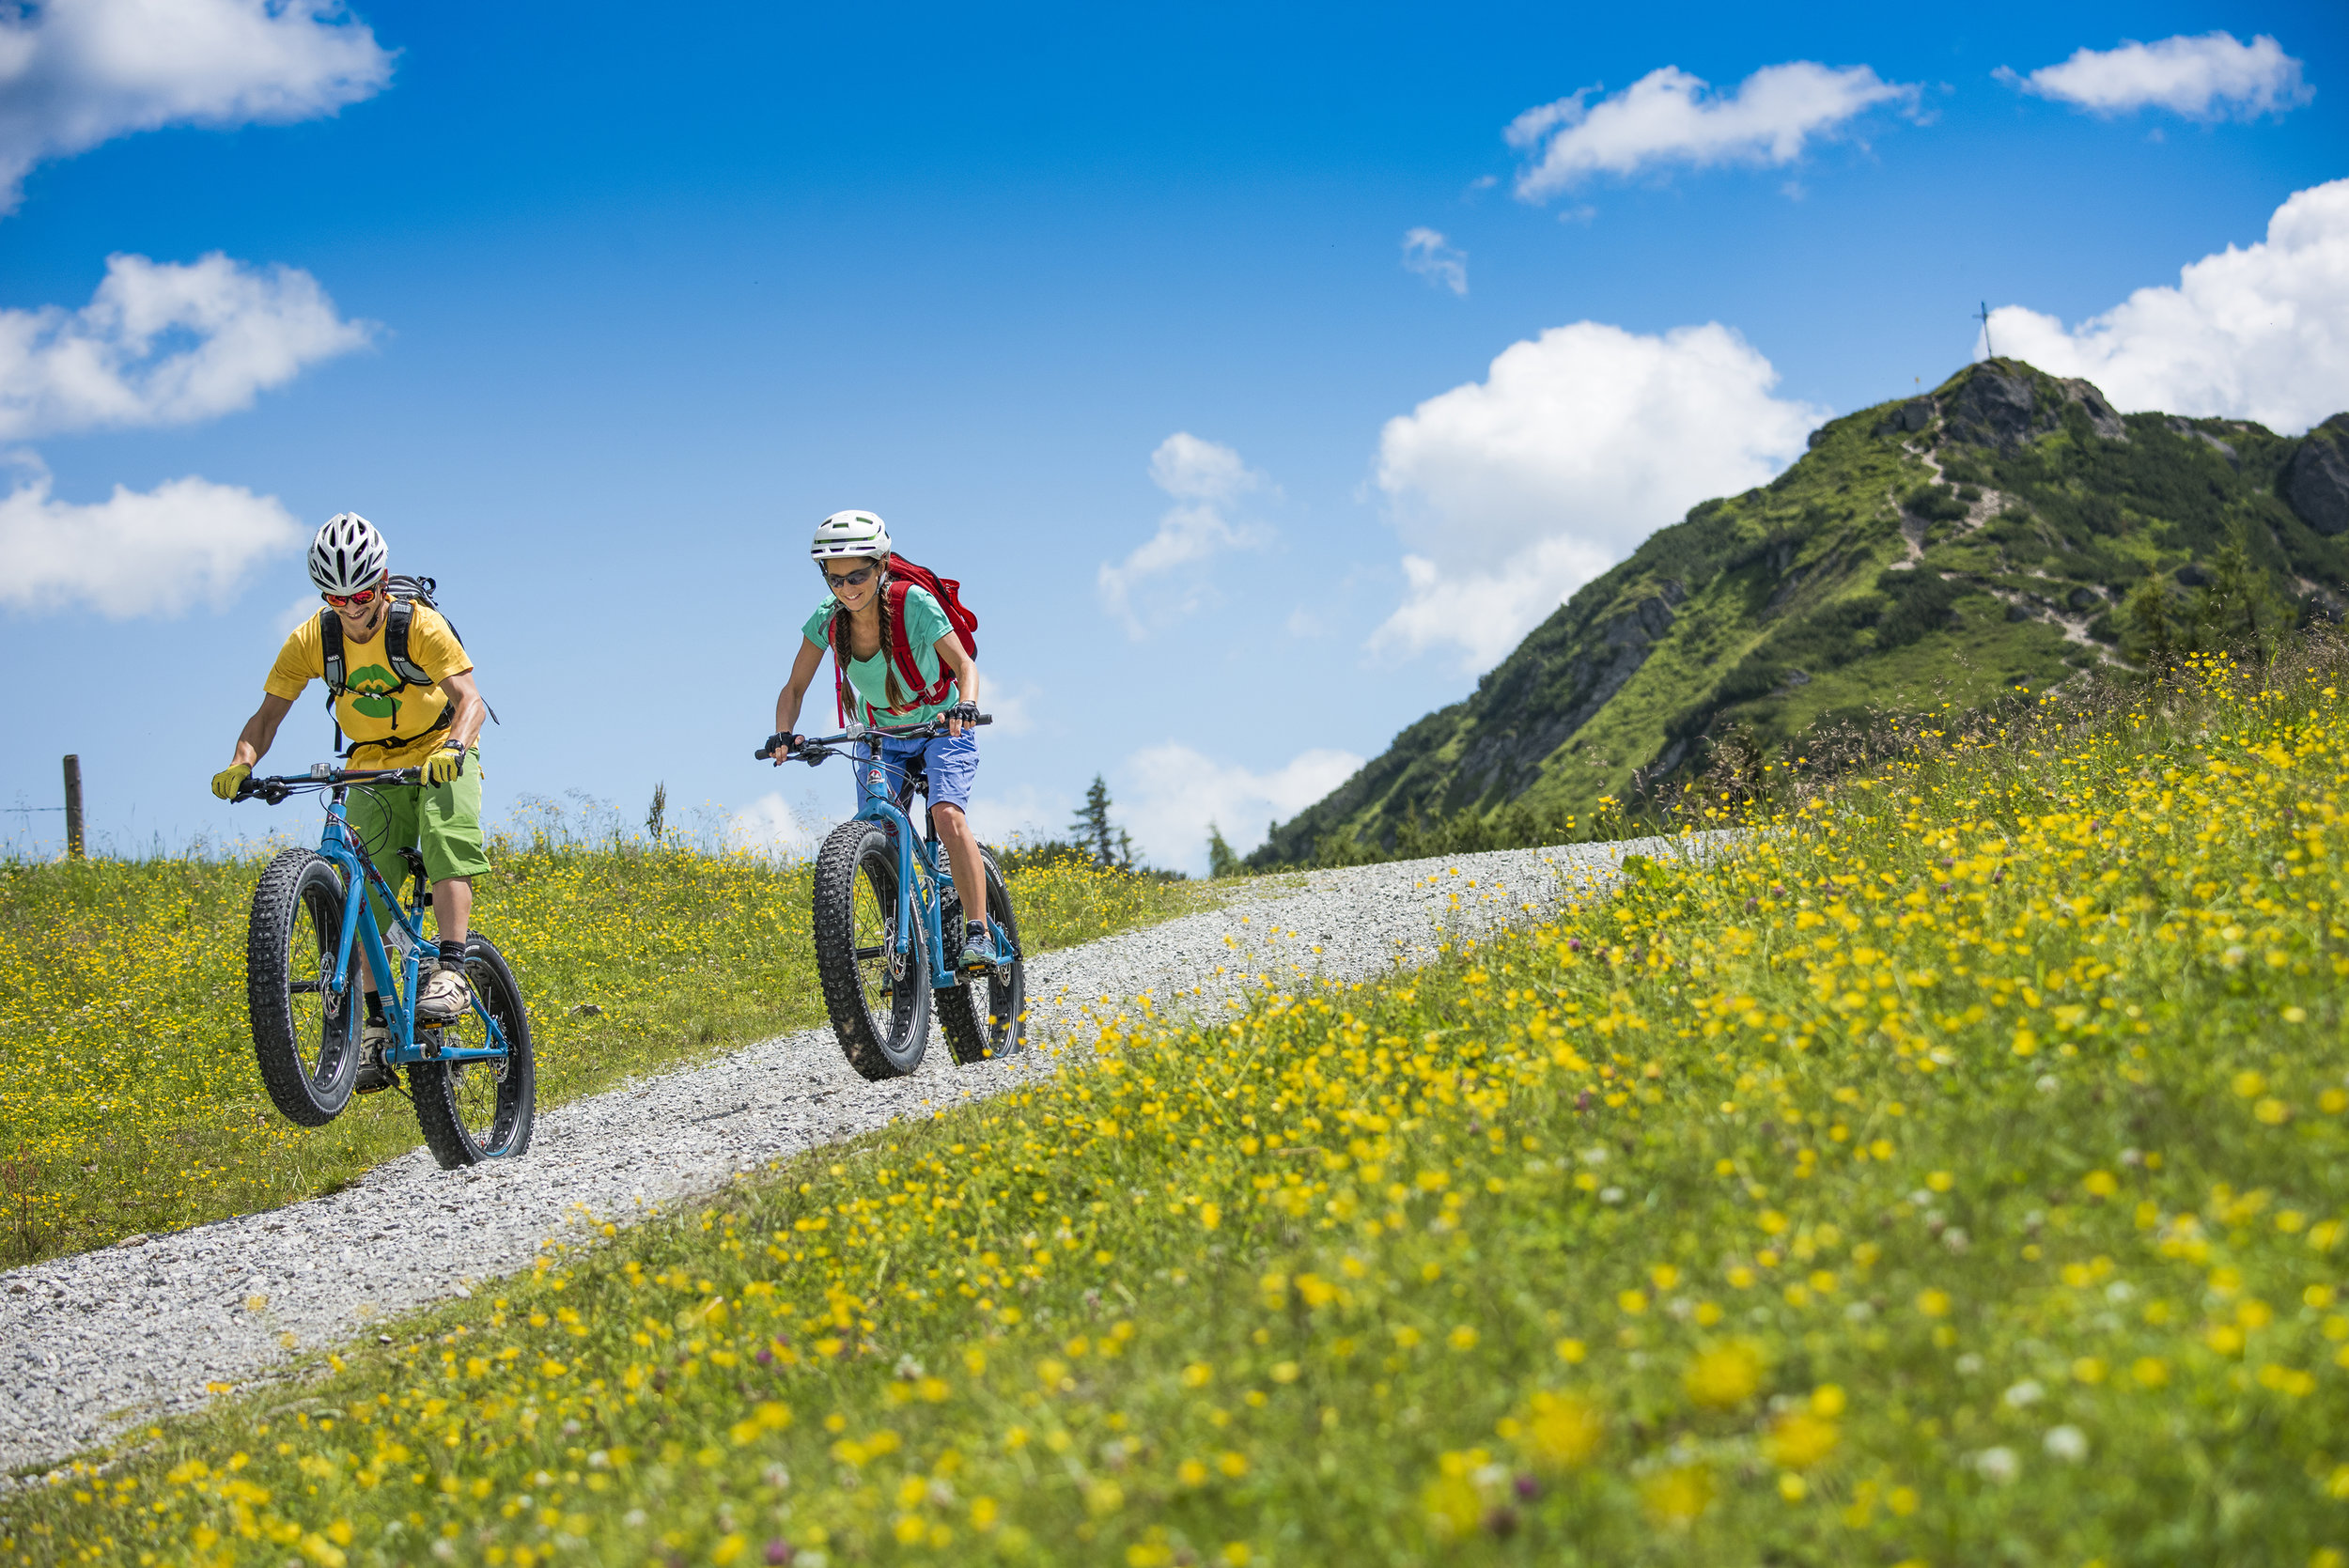 Mountainbike, Fatbike und Roadbike -